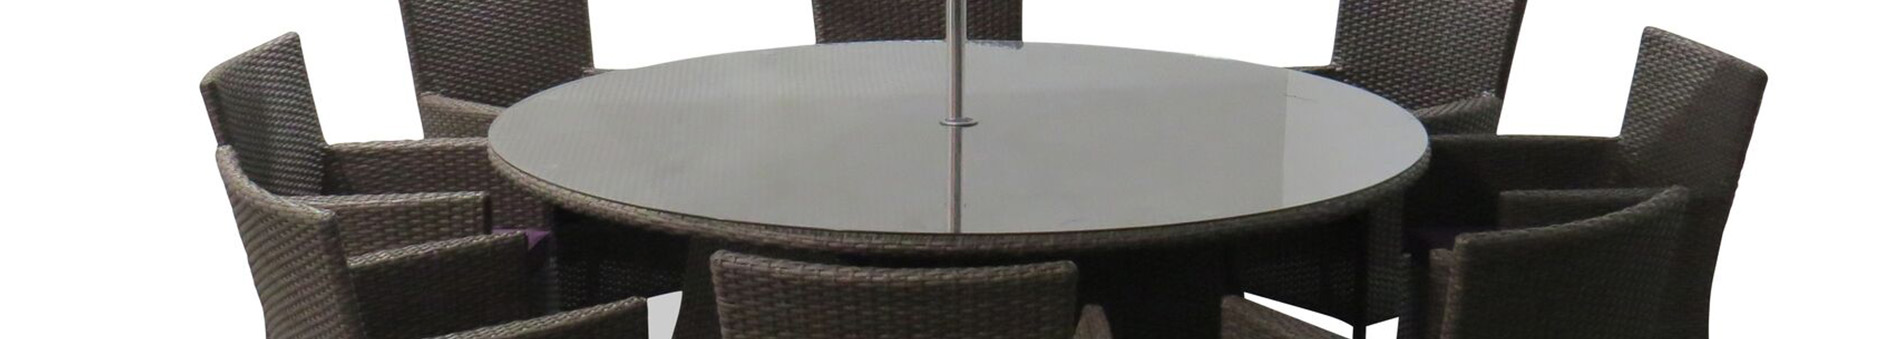 Sandringham 8 Seat Dining Set Round